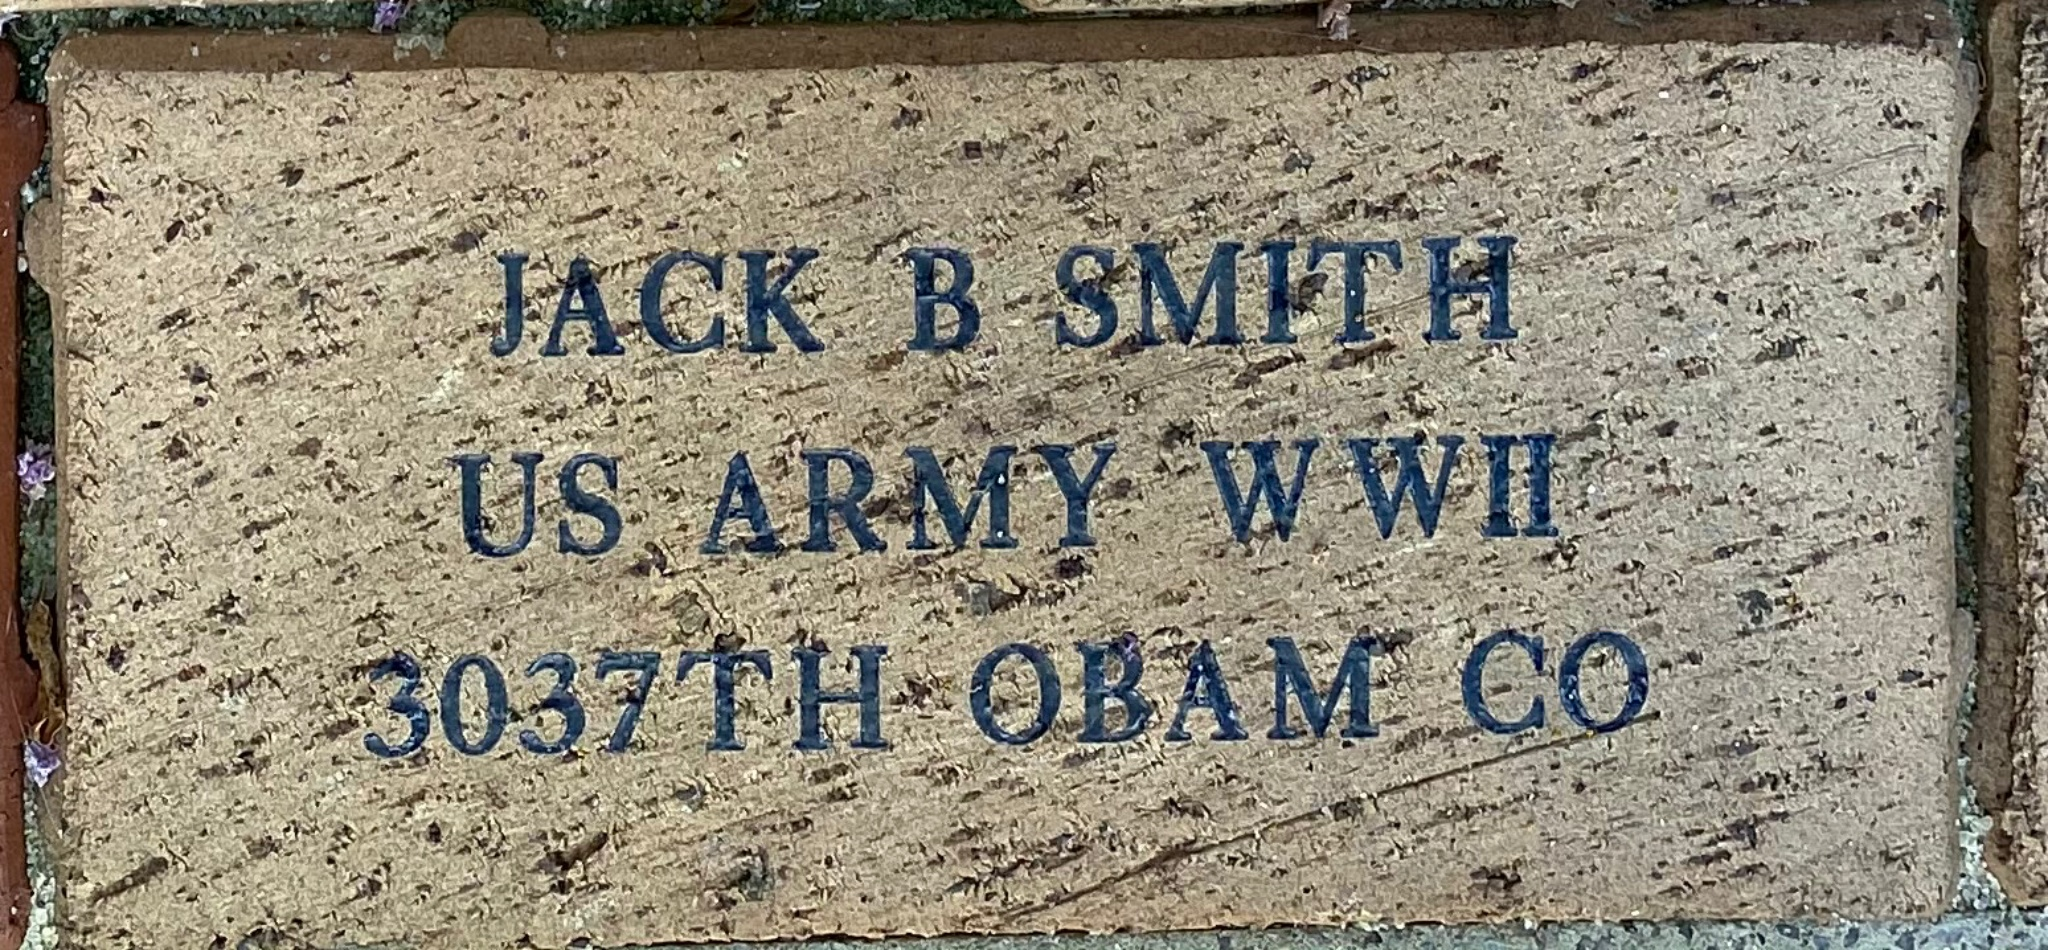 JACK B SMITH US ARMY WWII 3037TH OBAM CO